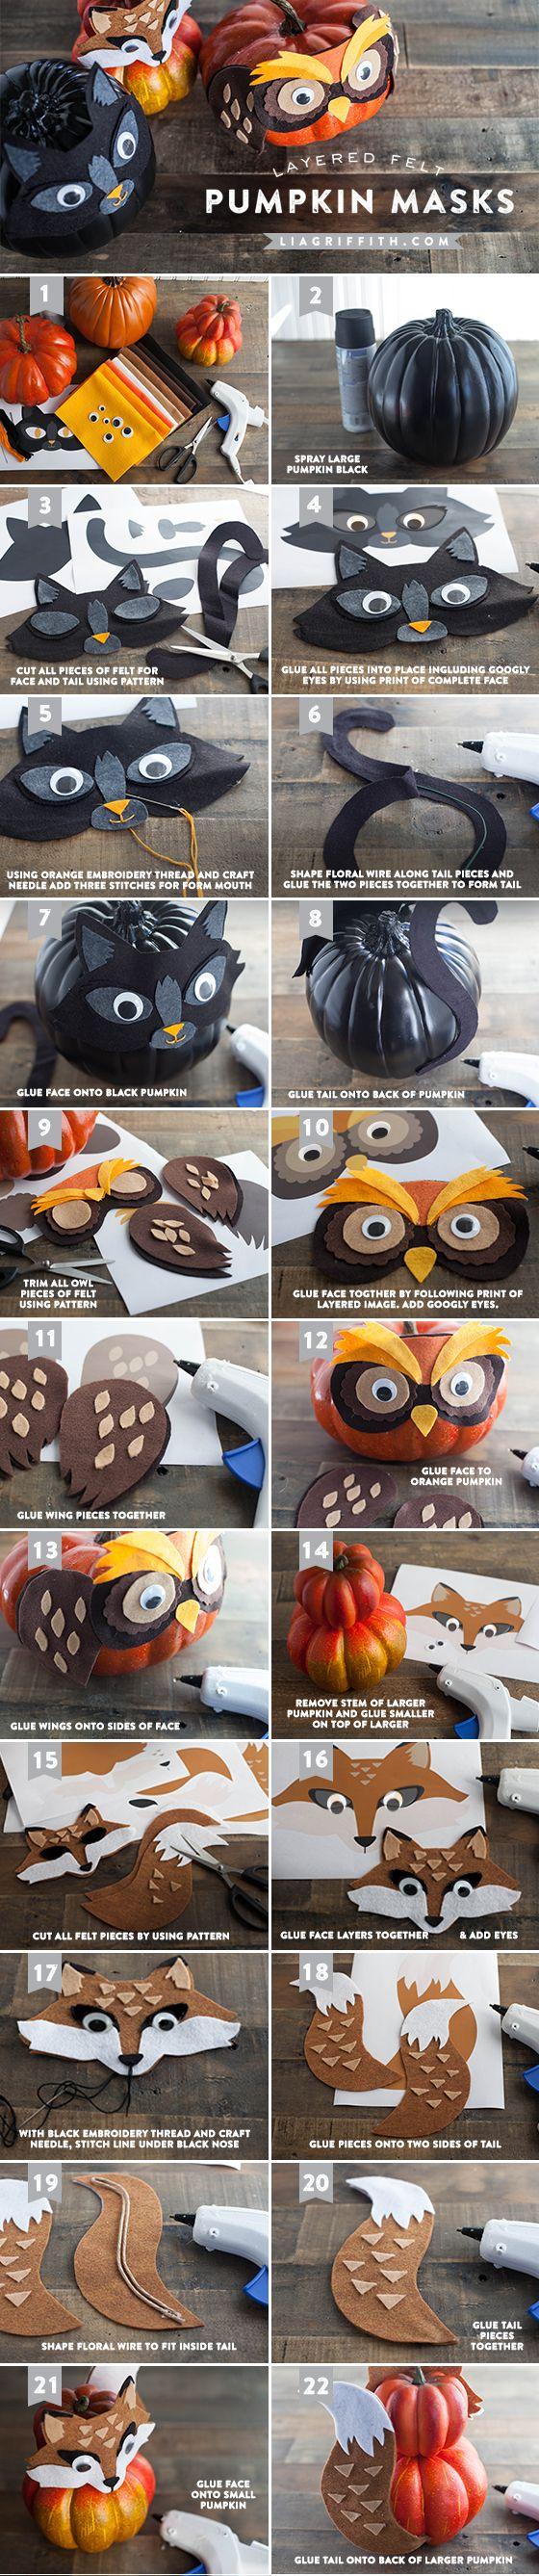 151 best Moore: Pumpkin Decorating images on Pinterest